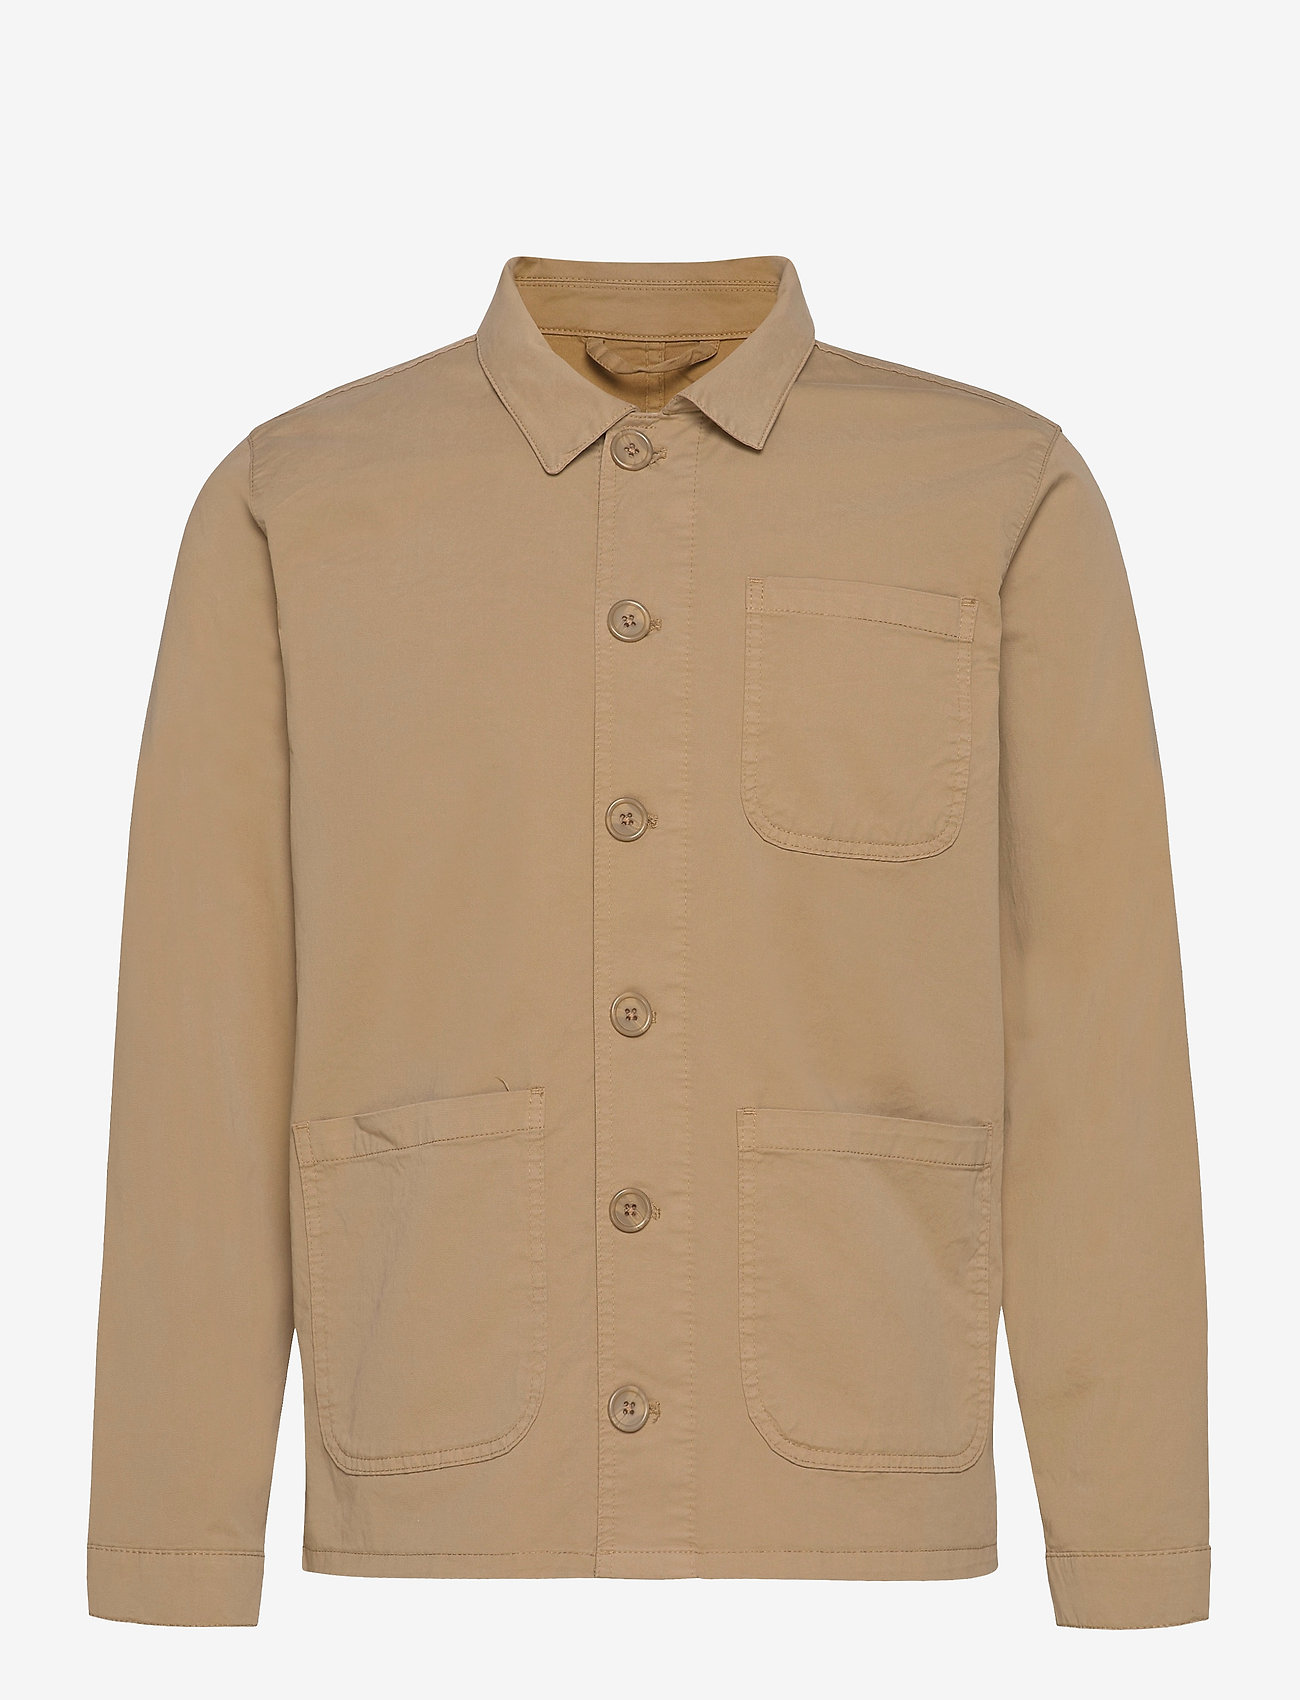 By Garment Makers - The Organic Workwear Jacket - vêtements - khaki - 1